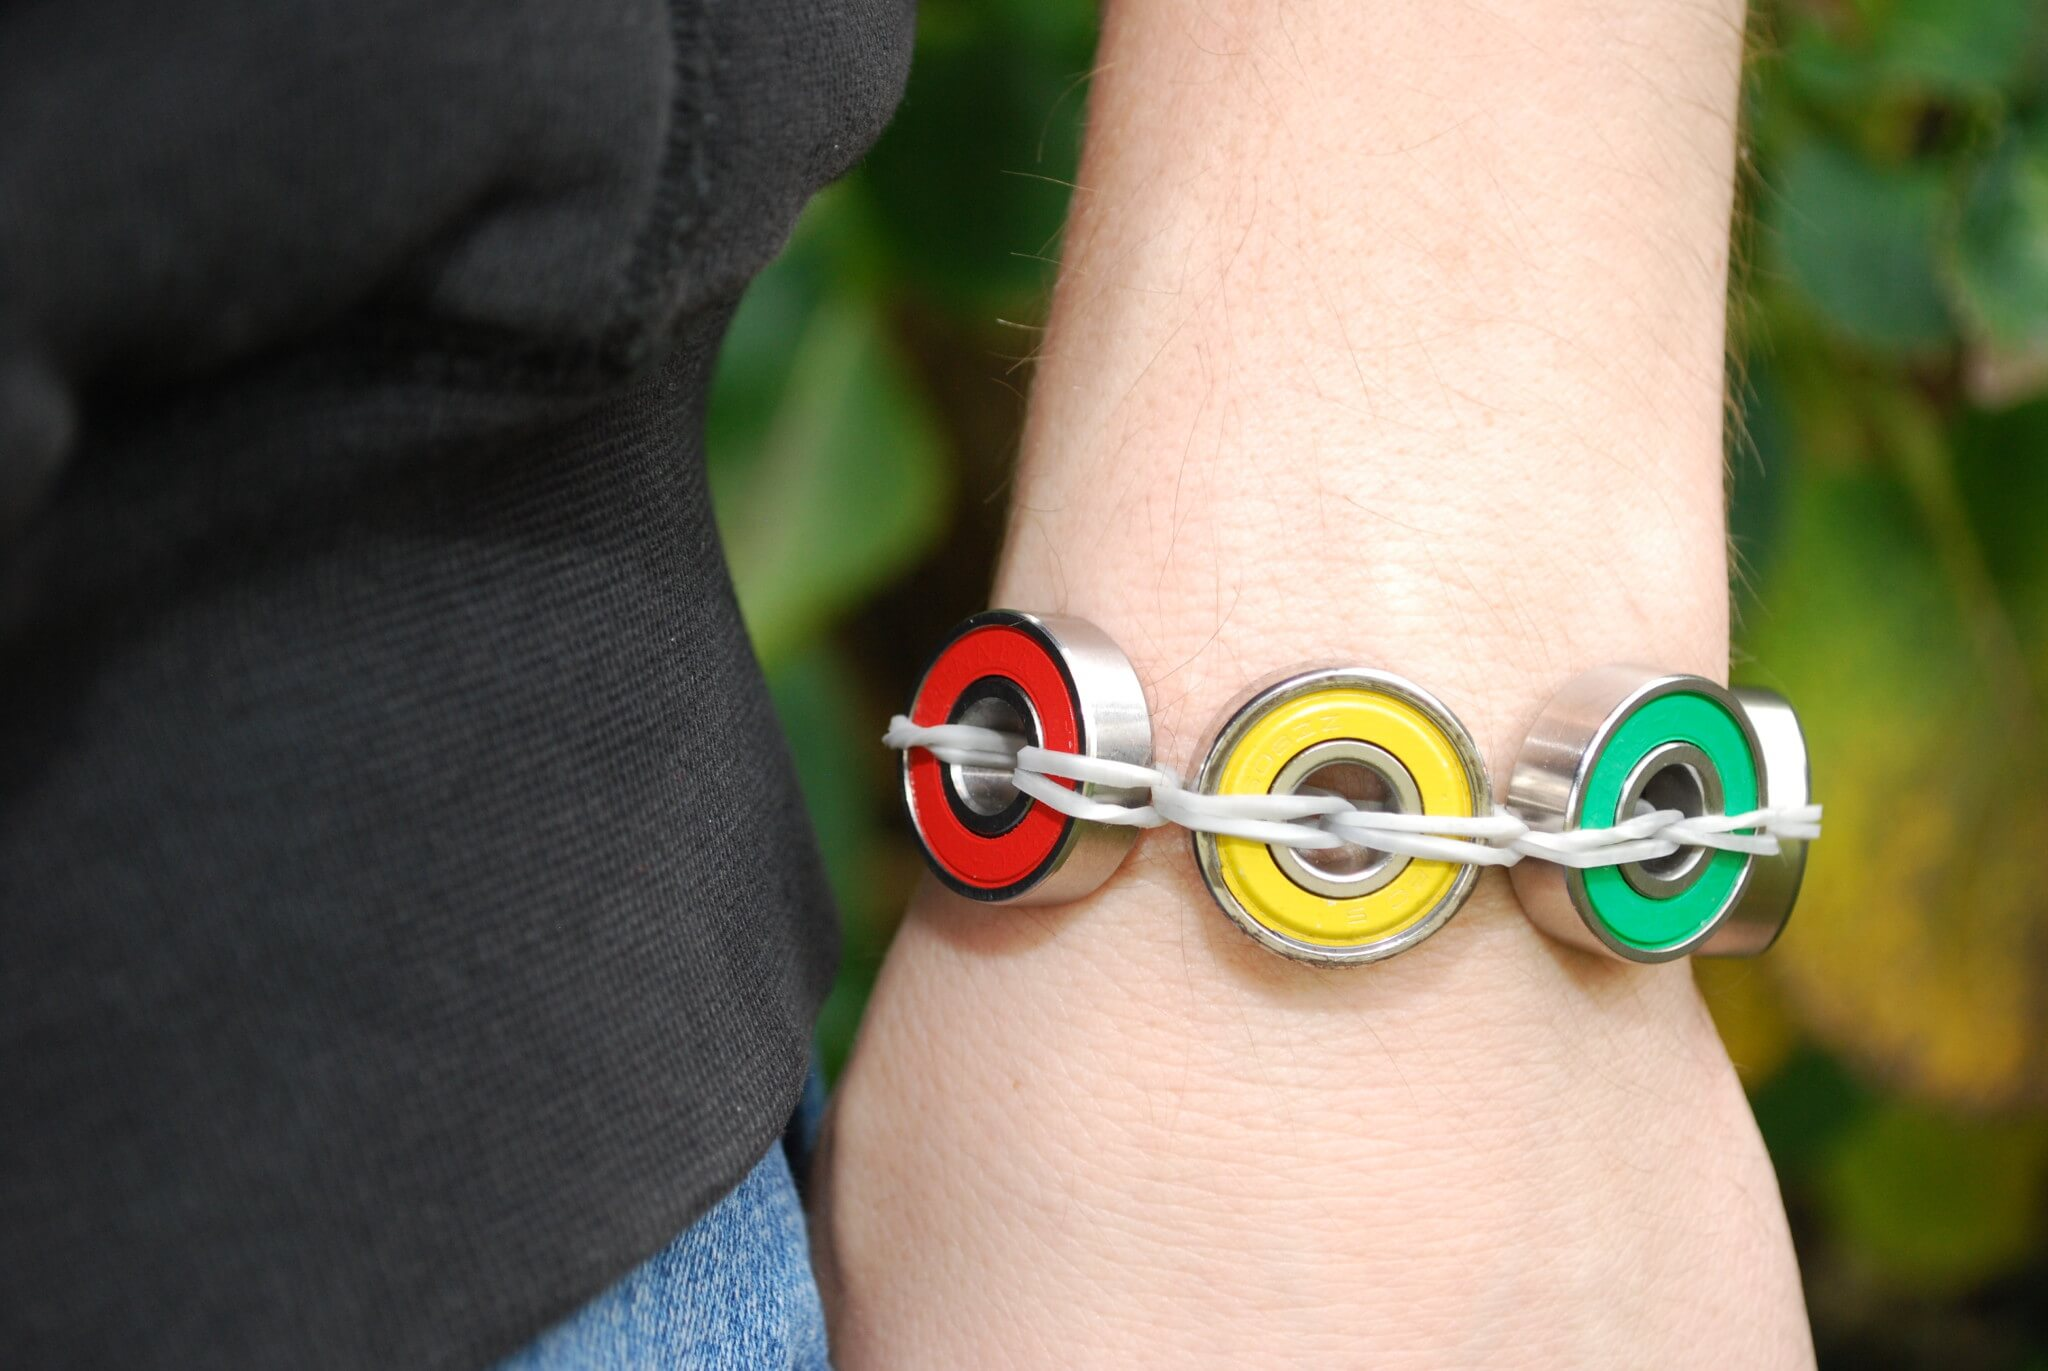 skate jewelry, recycled skateboards